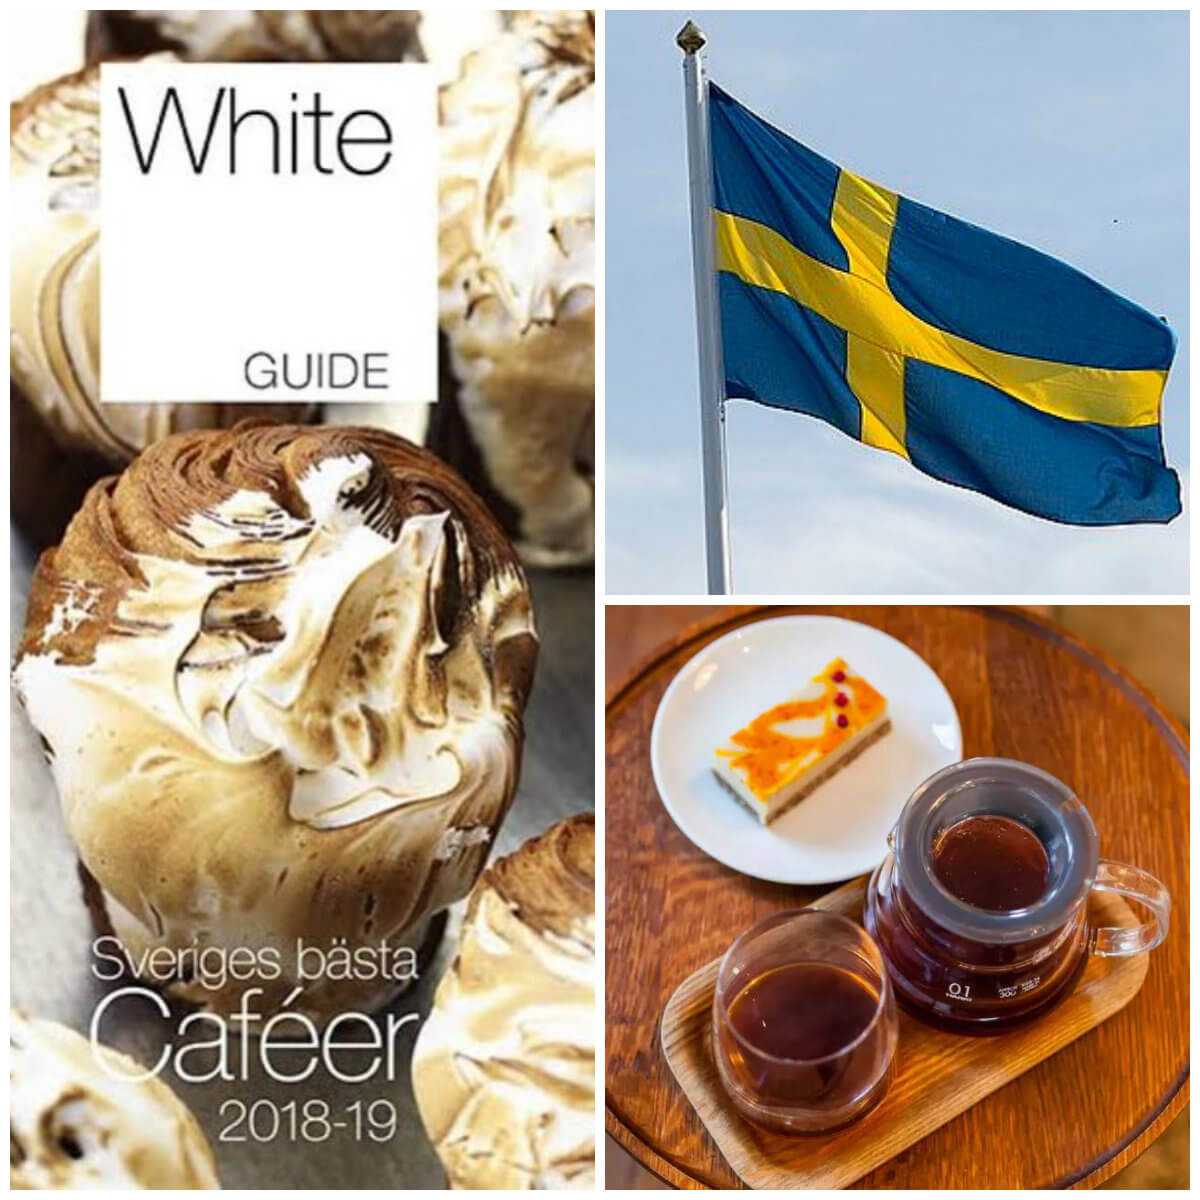 White Guide Café 2018 – Caféer per landskap